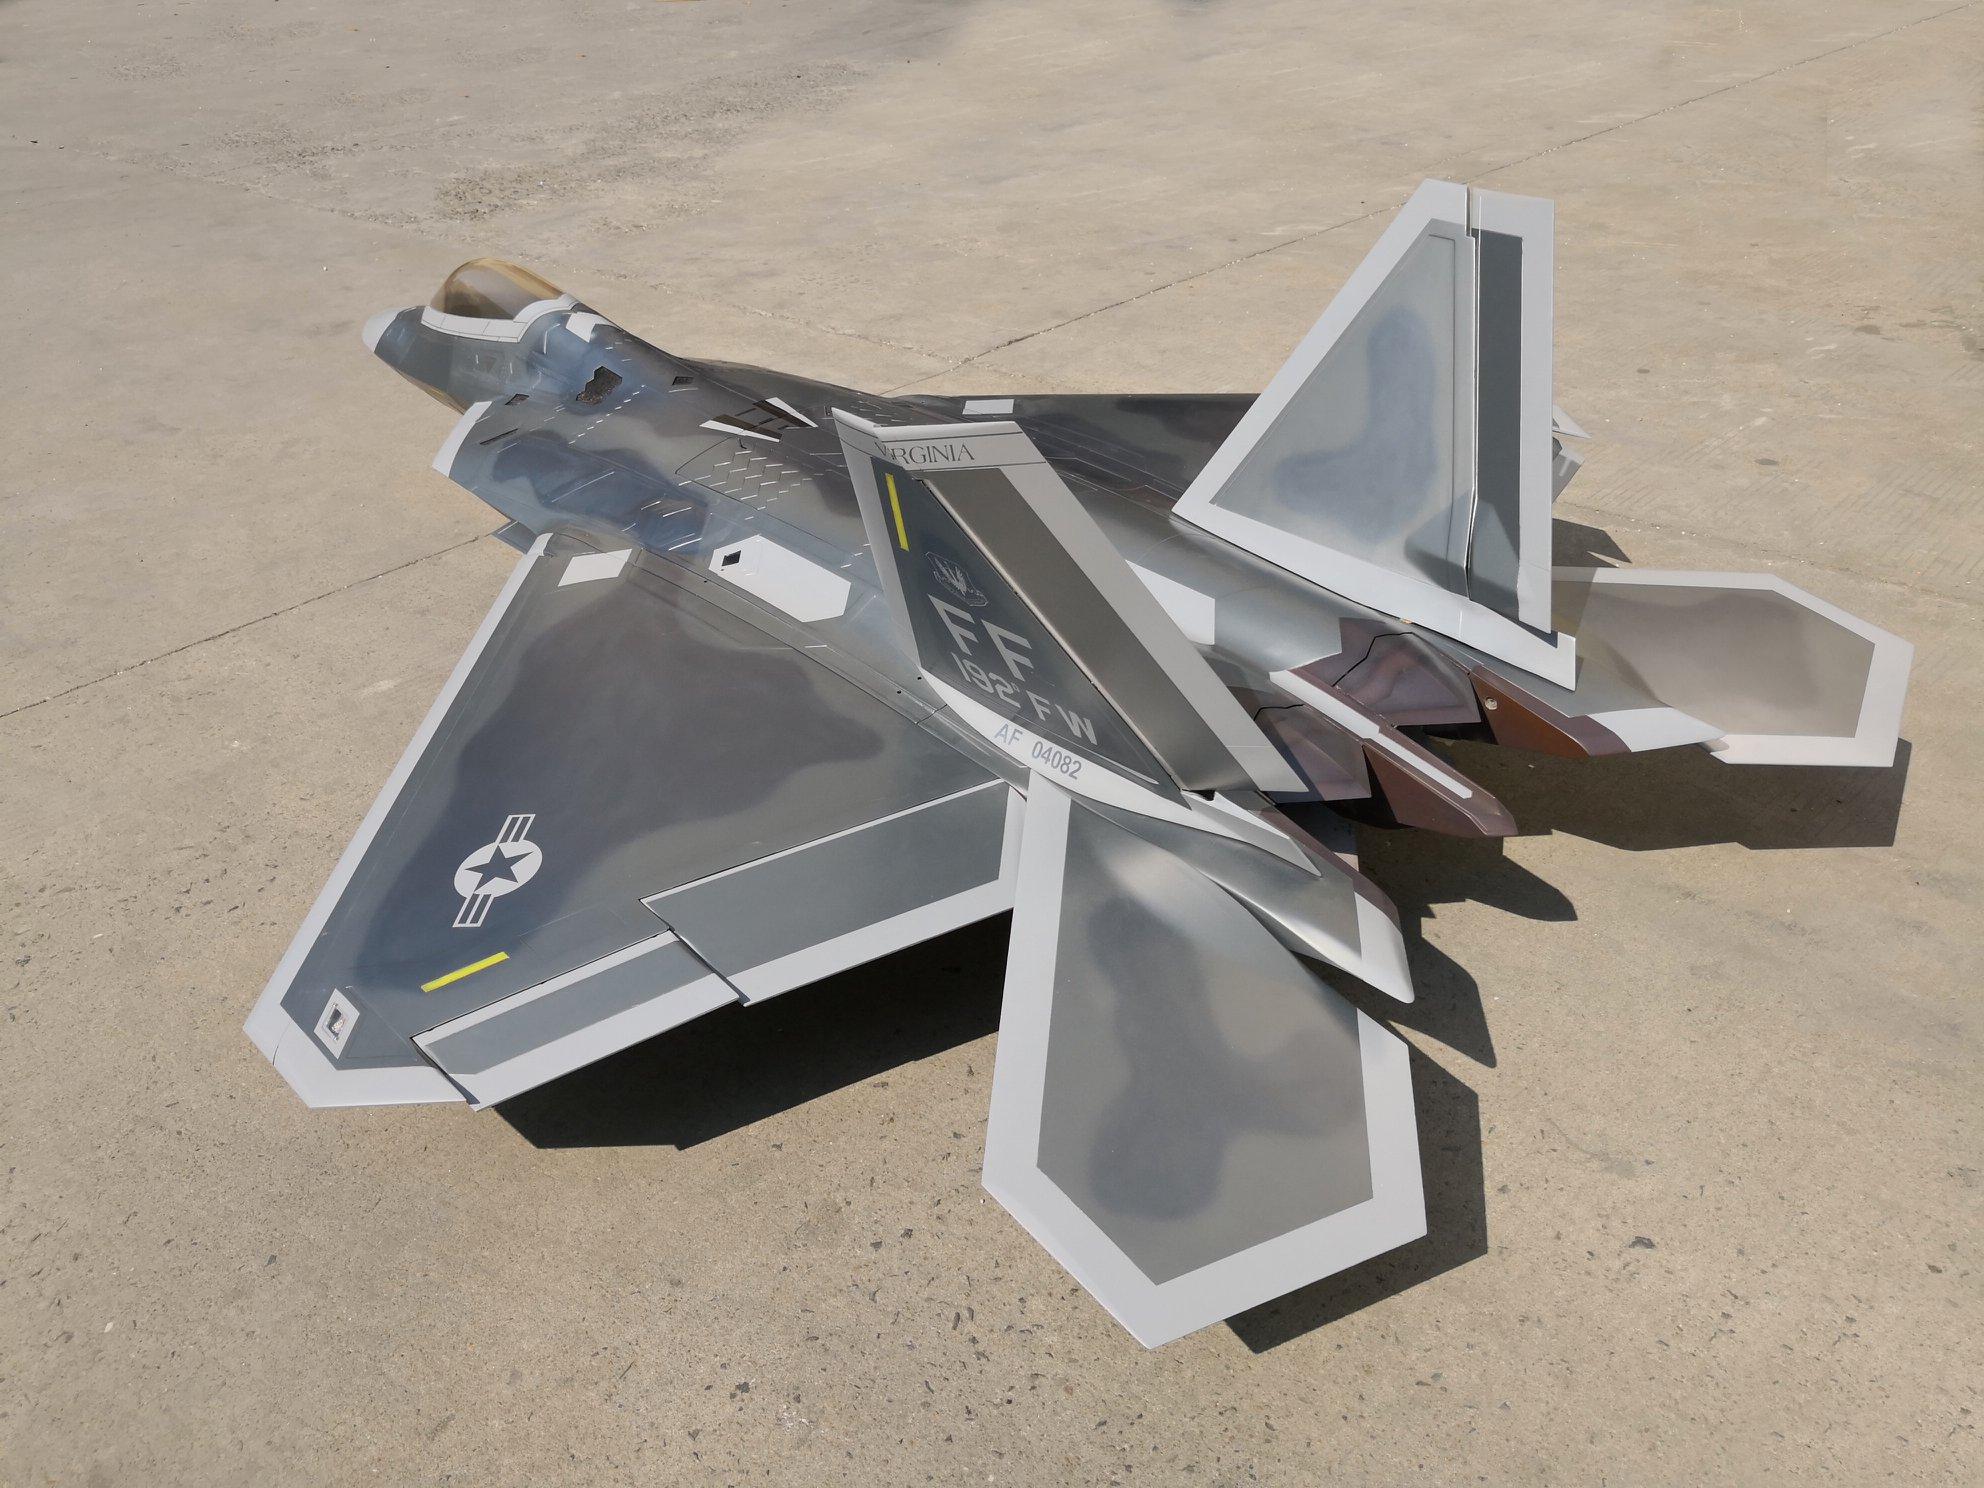 T-One Models F-22 Raptor 1/7th